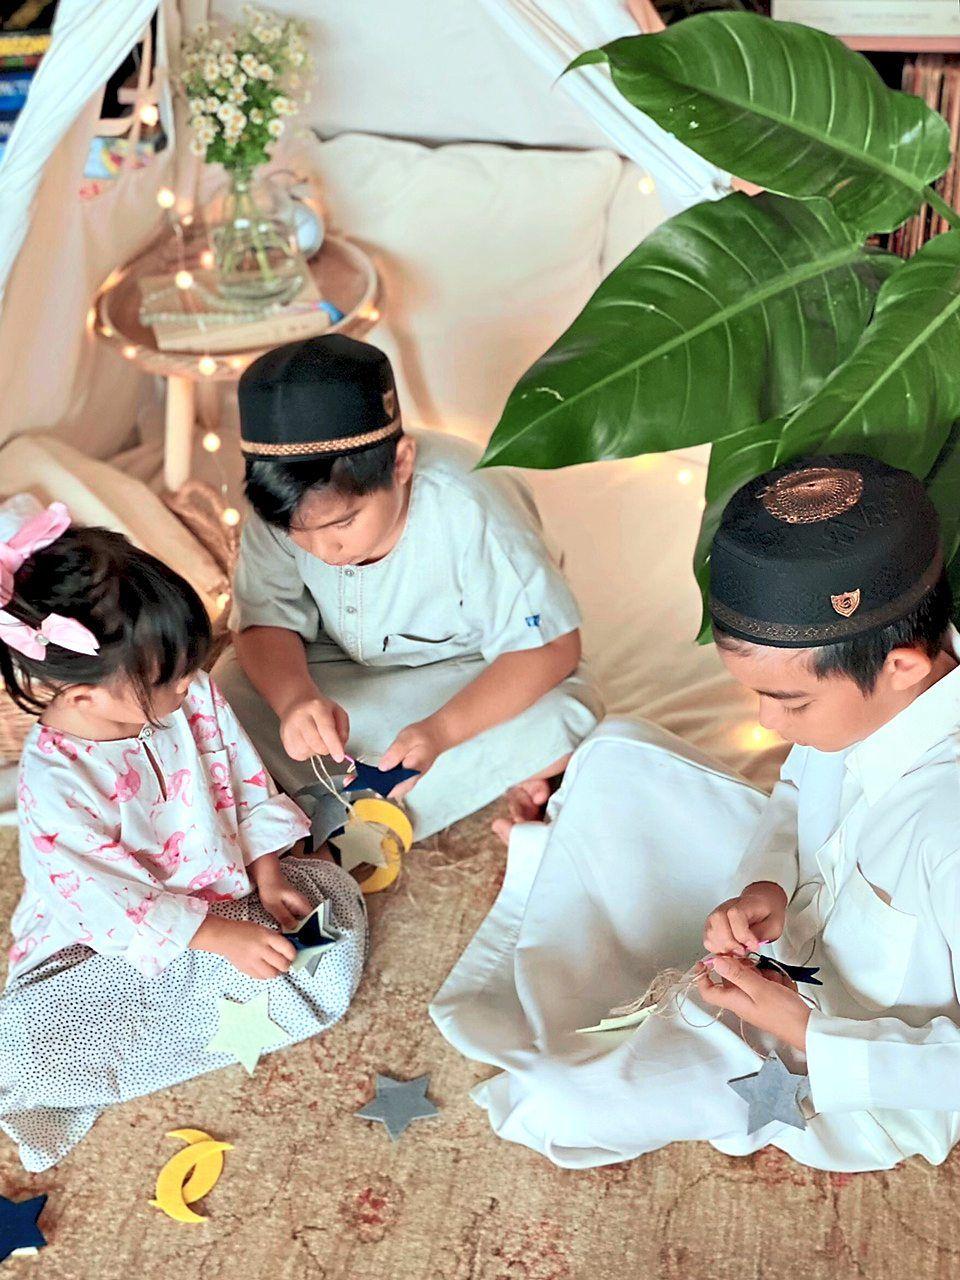 The children helping to prepare decorations for Ramadan. Photo: Deelaila Ramzi